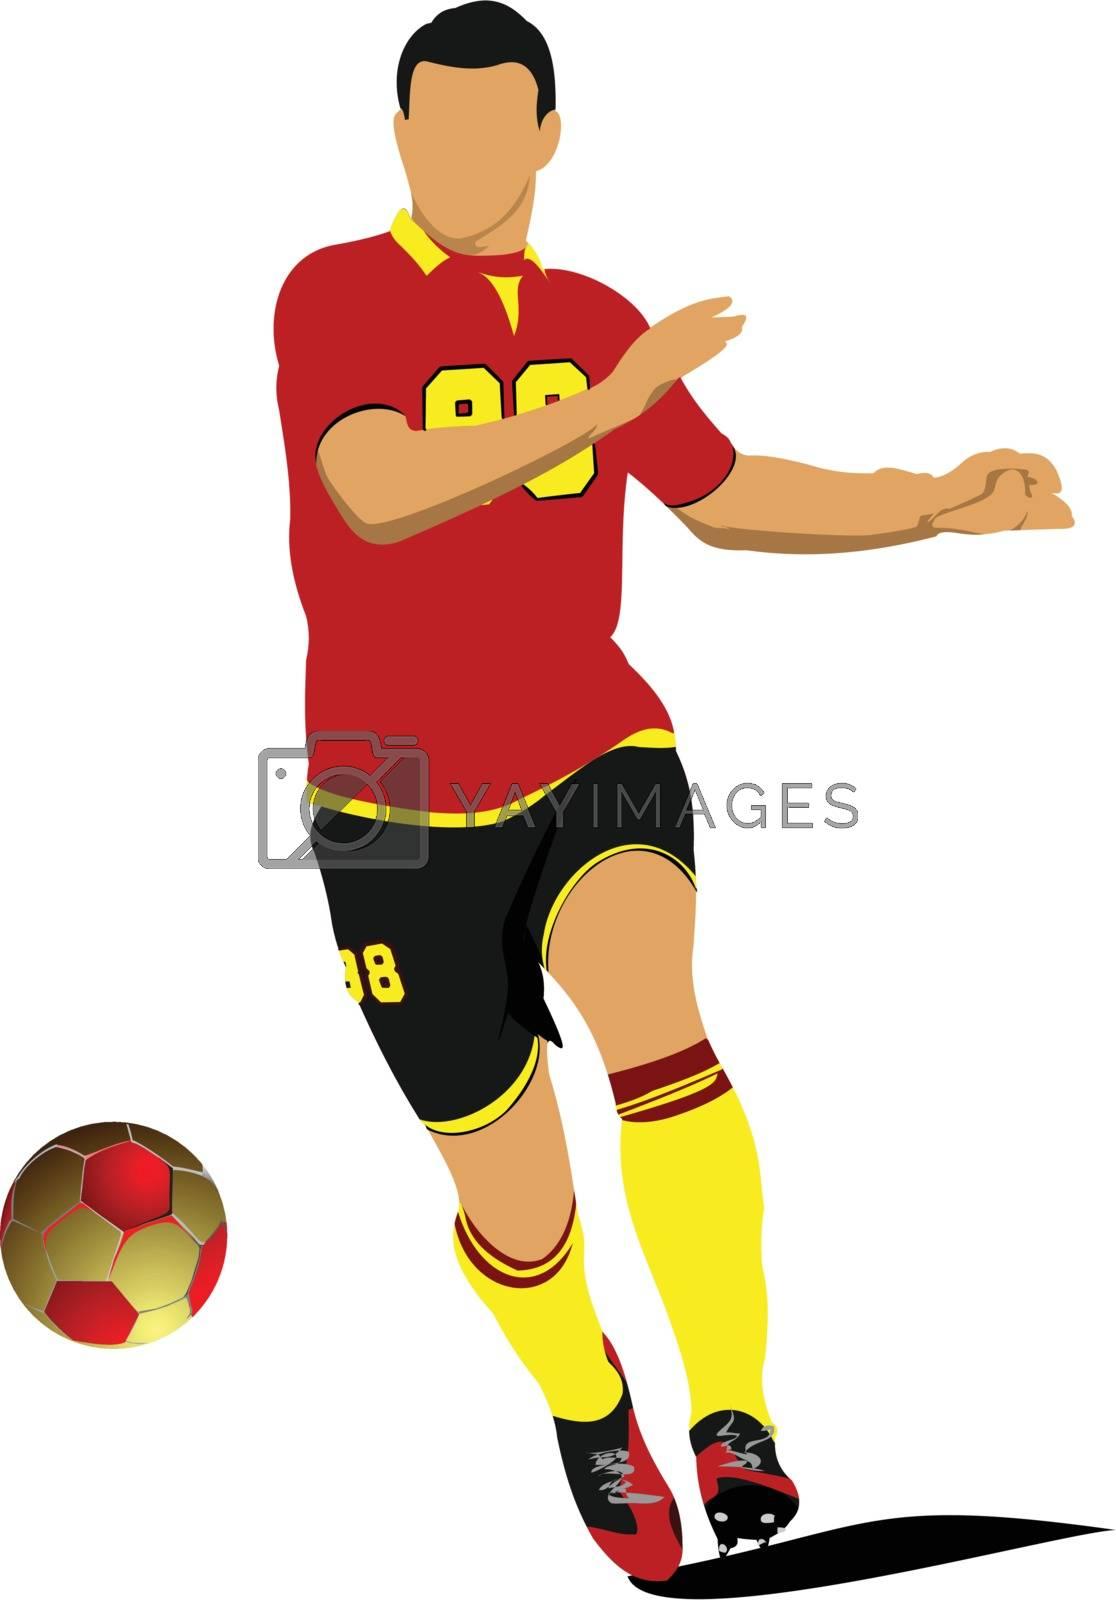 Soccer player. Football player. Vector illustration